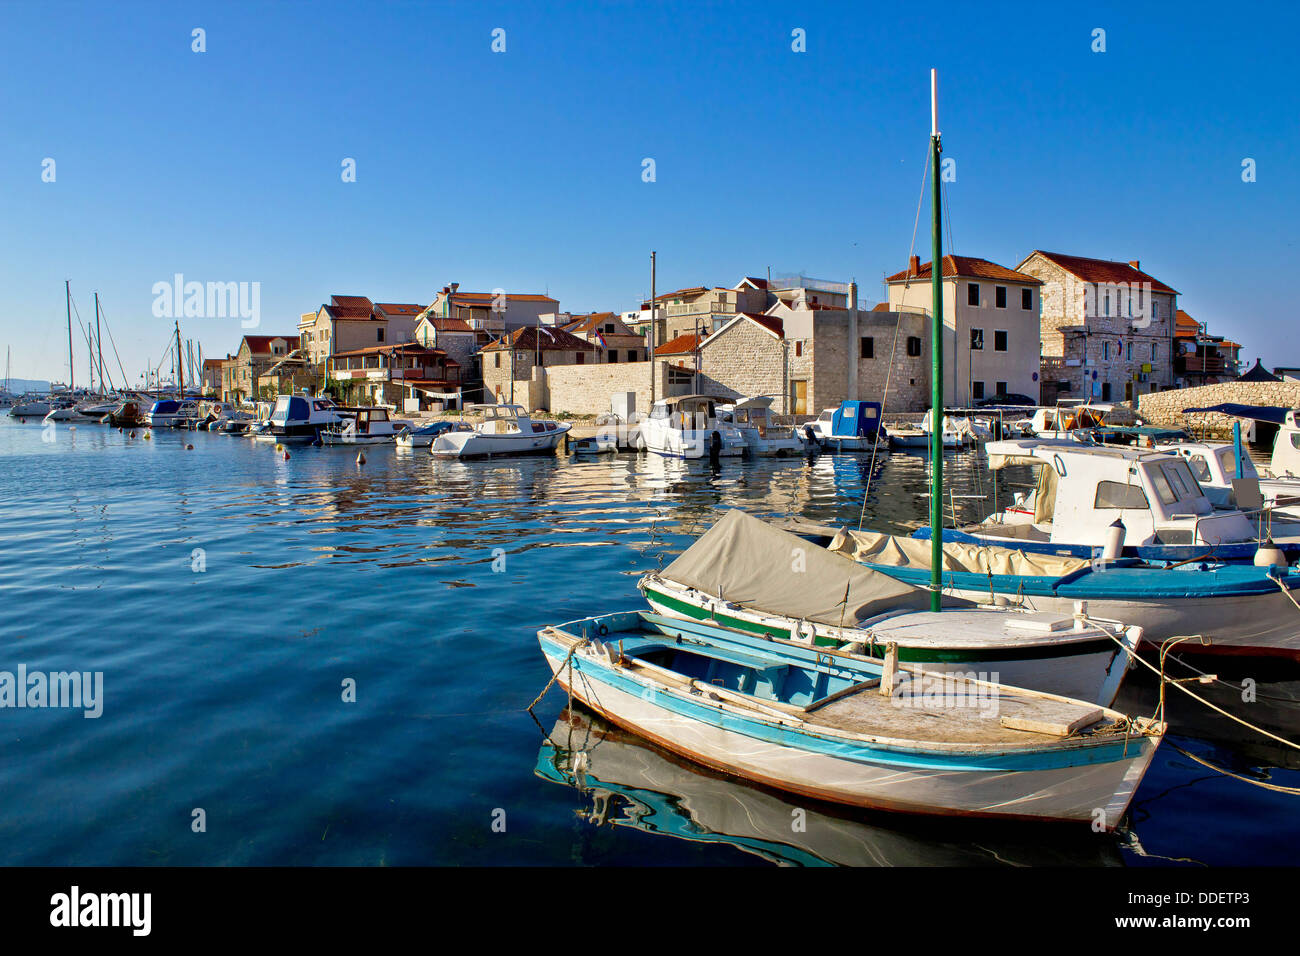 Adriatic town of Tribunj waterfront, Dalmatia, Croatia - Stock Image